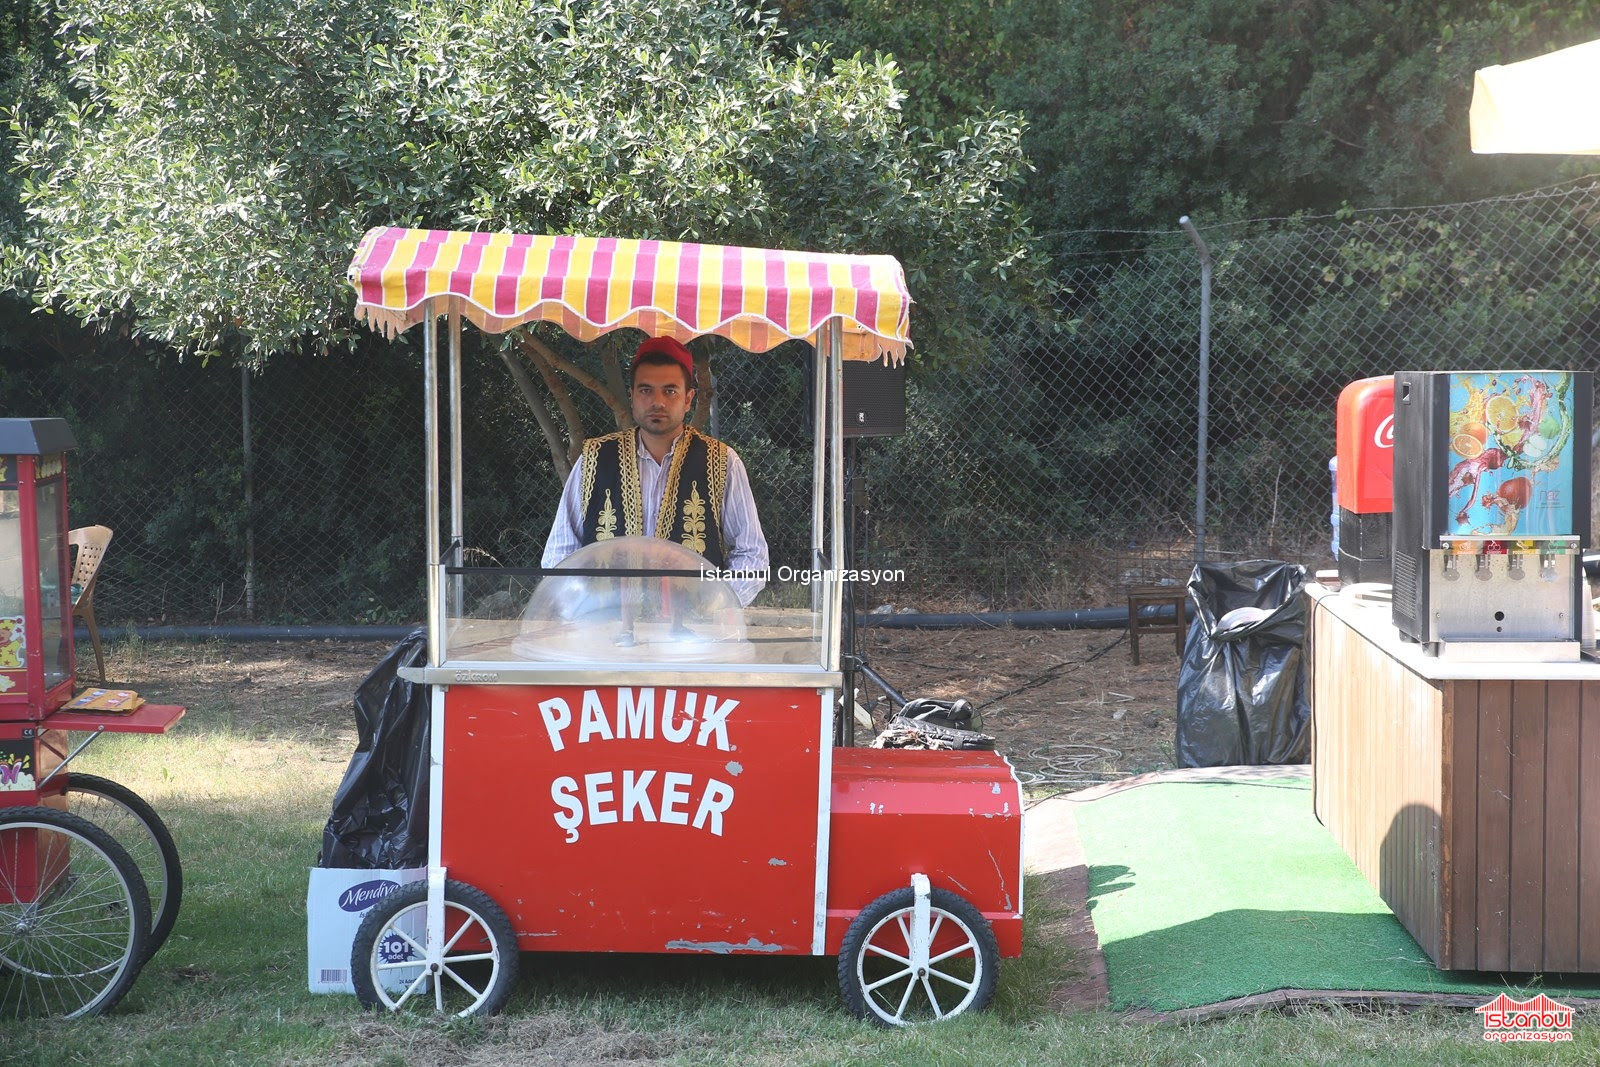 Pamuk şeker Ve Pamuk Helvacı Istanbul Organizasyon